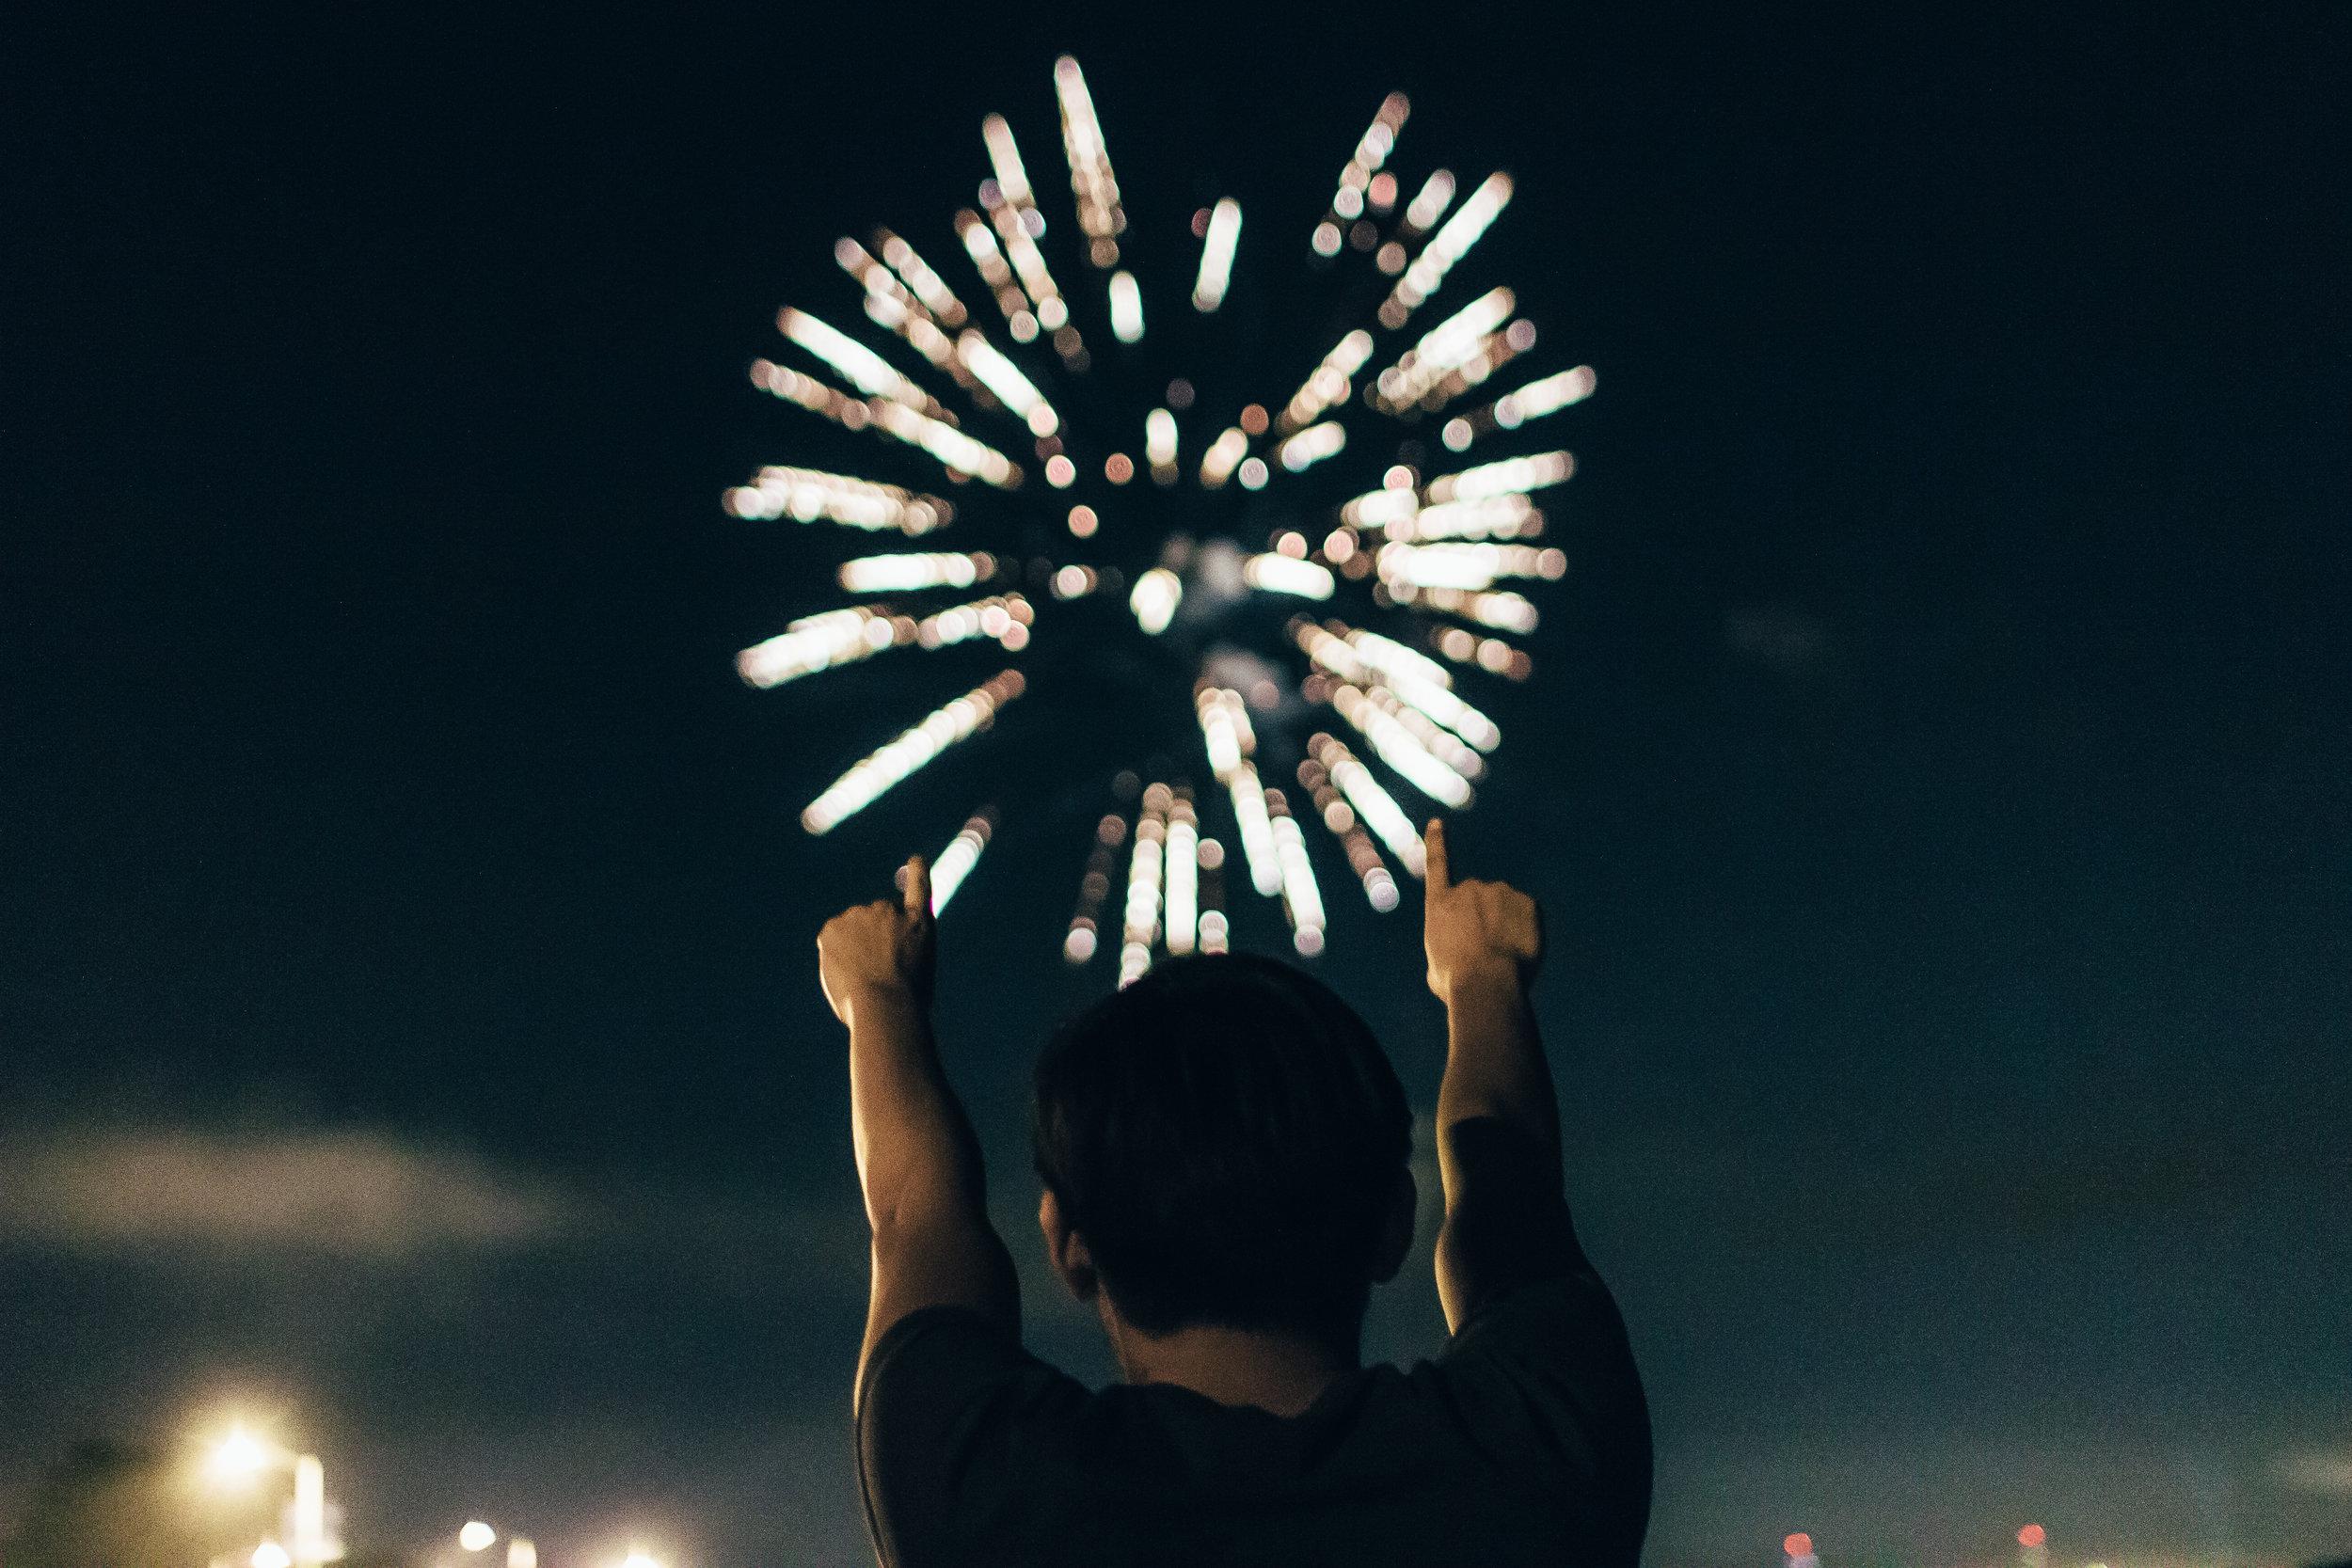 New Year,Same God - by Joshua Kyle Dunn